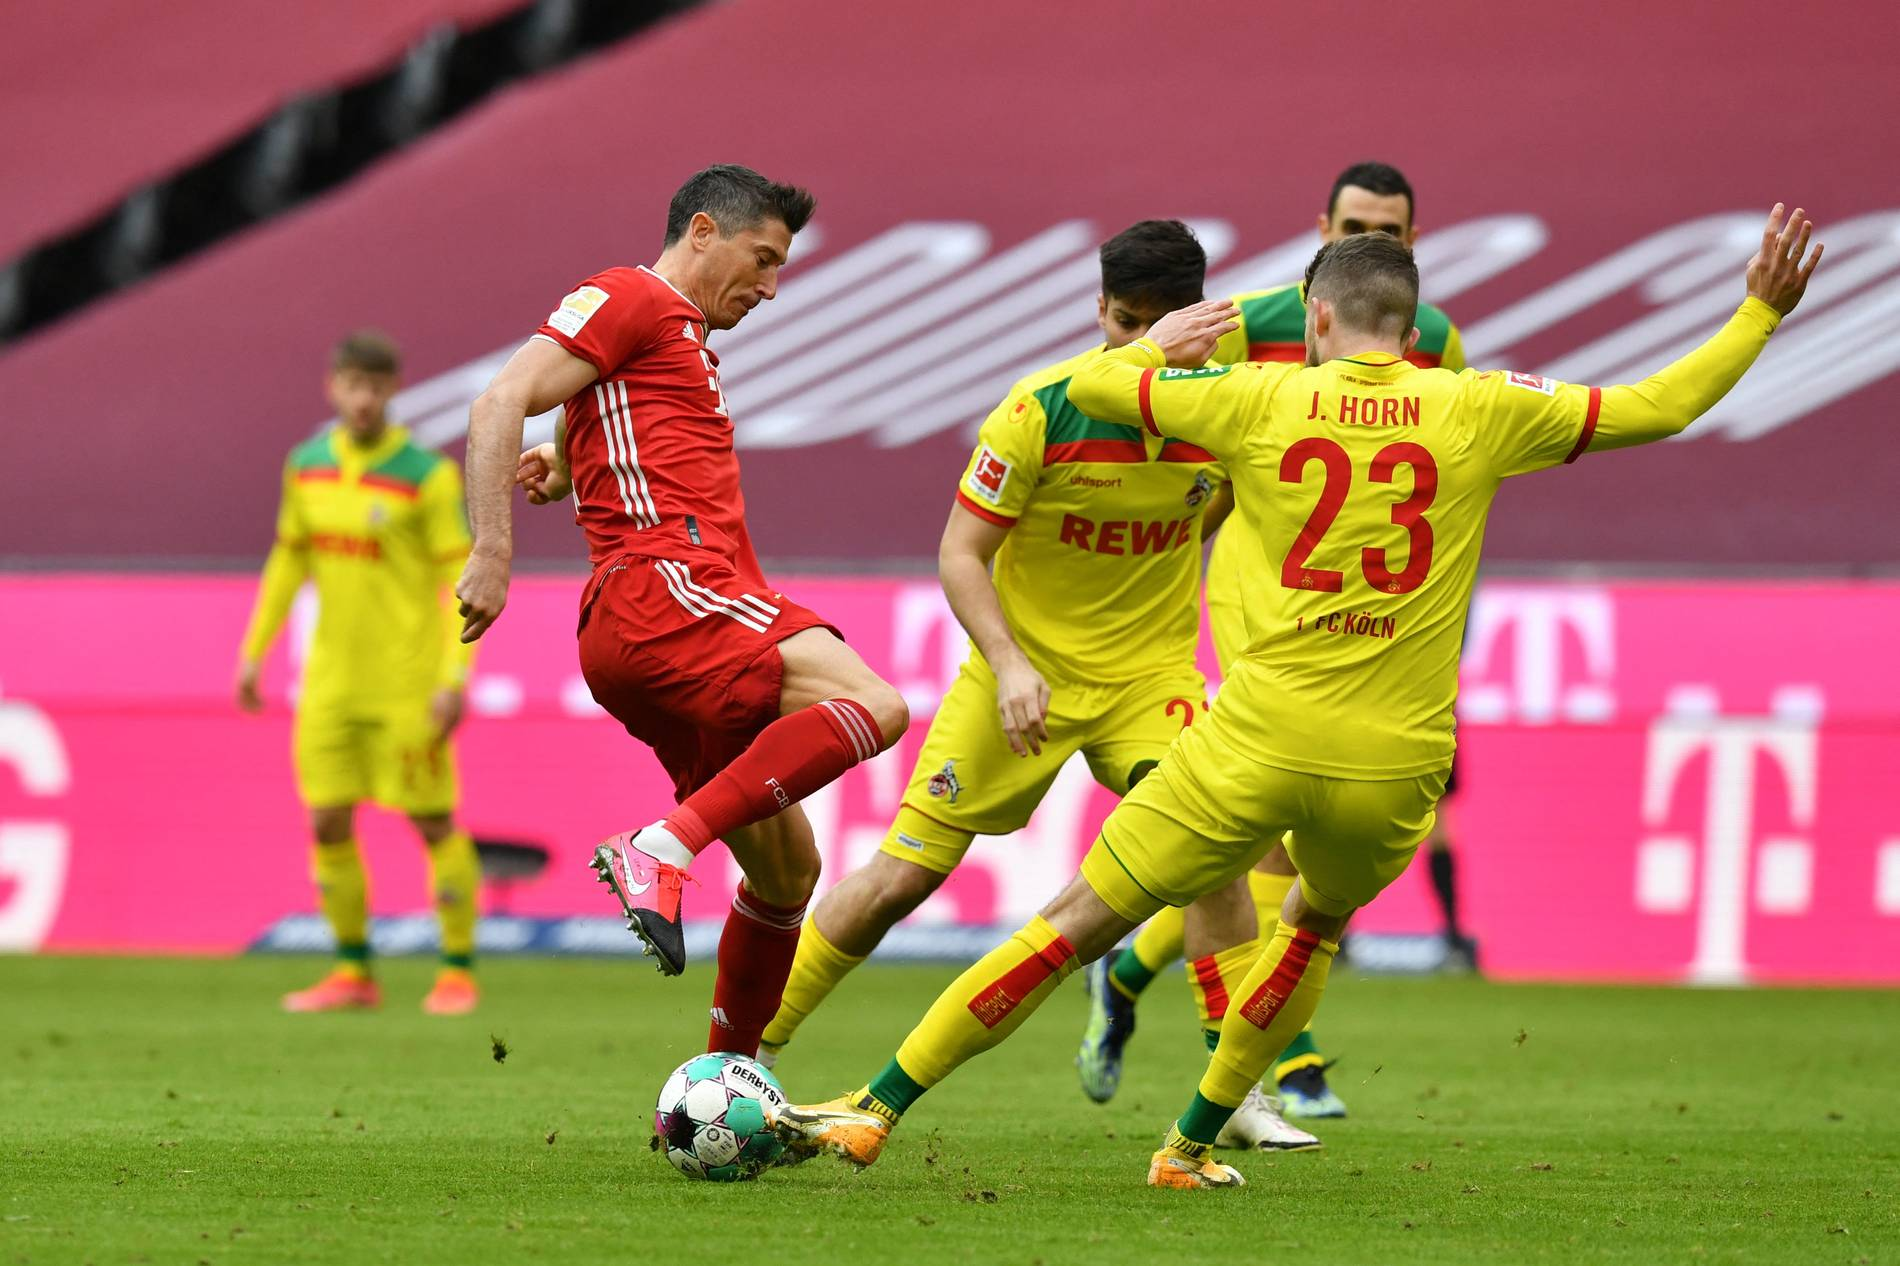 Bundesliga: Bayern München besiegt den 1. FC Köln 5:1